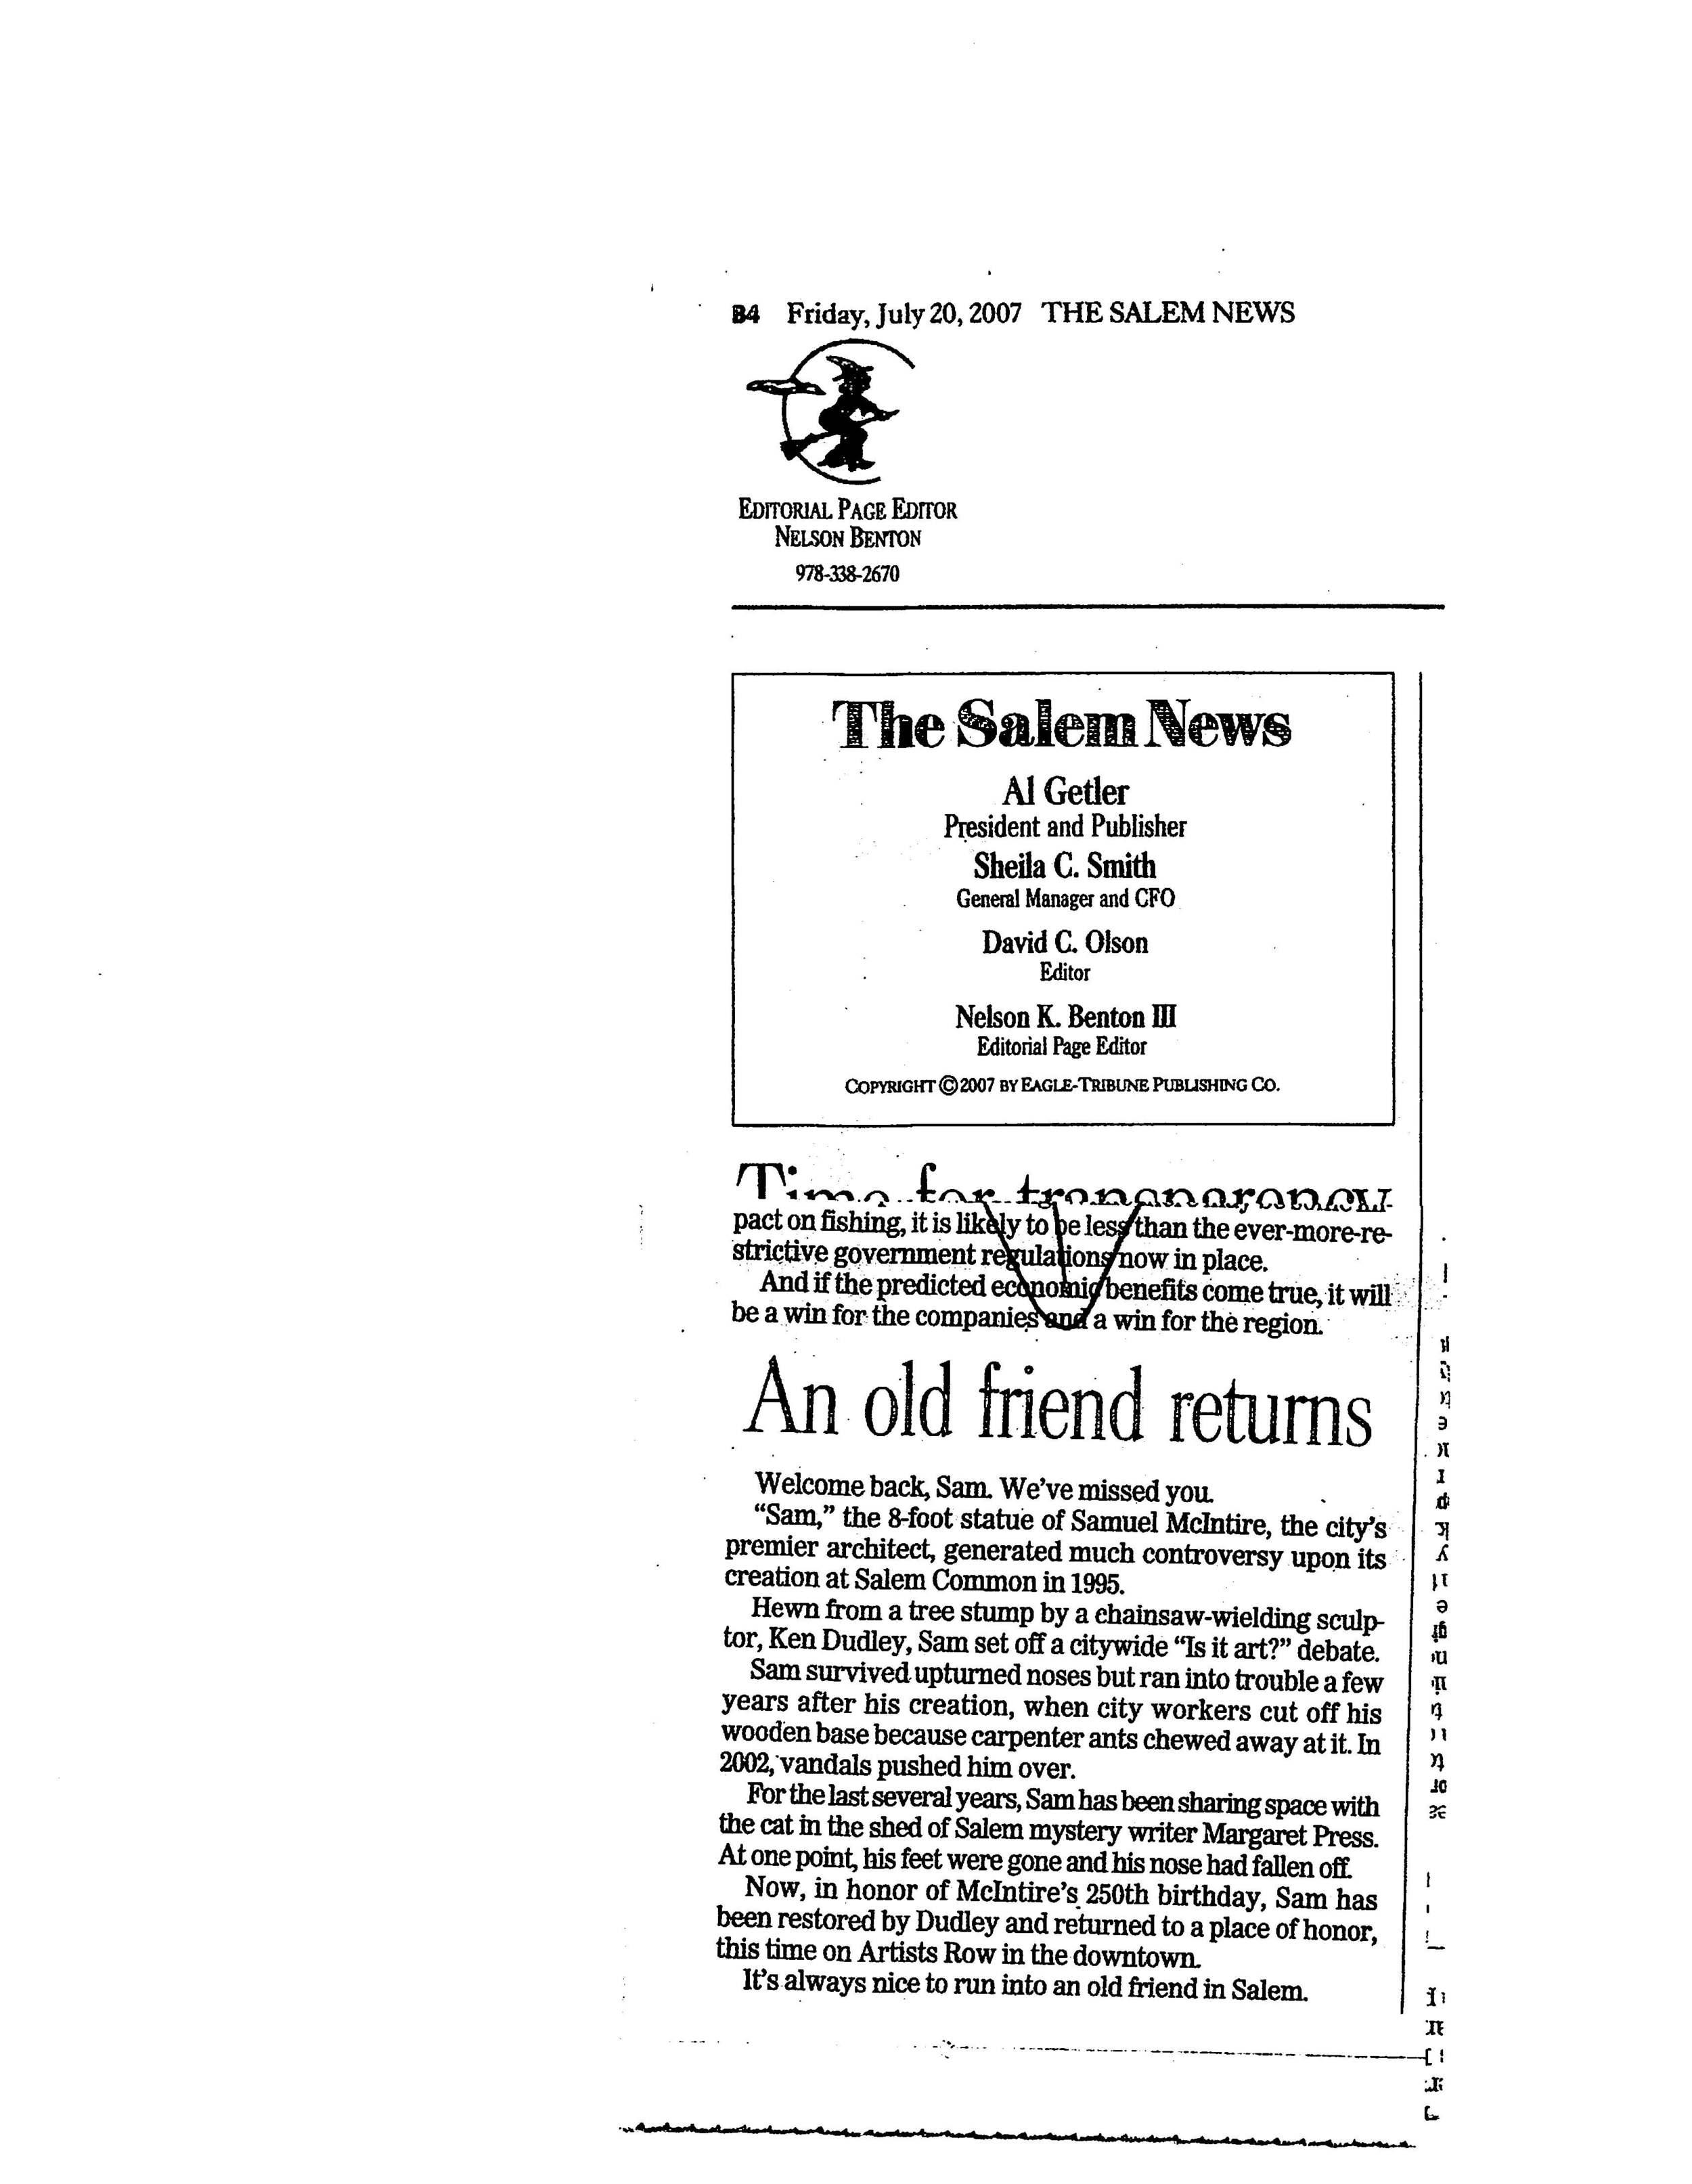 Sam-news-articles_Page_6.jpg